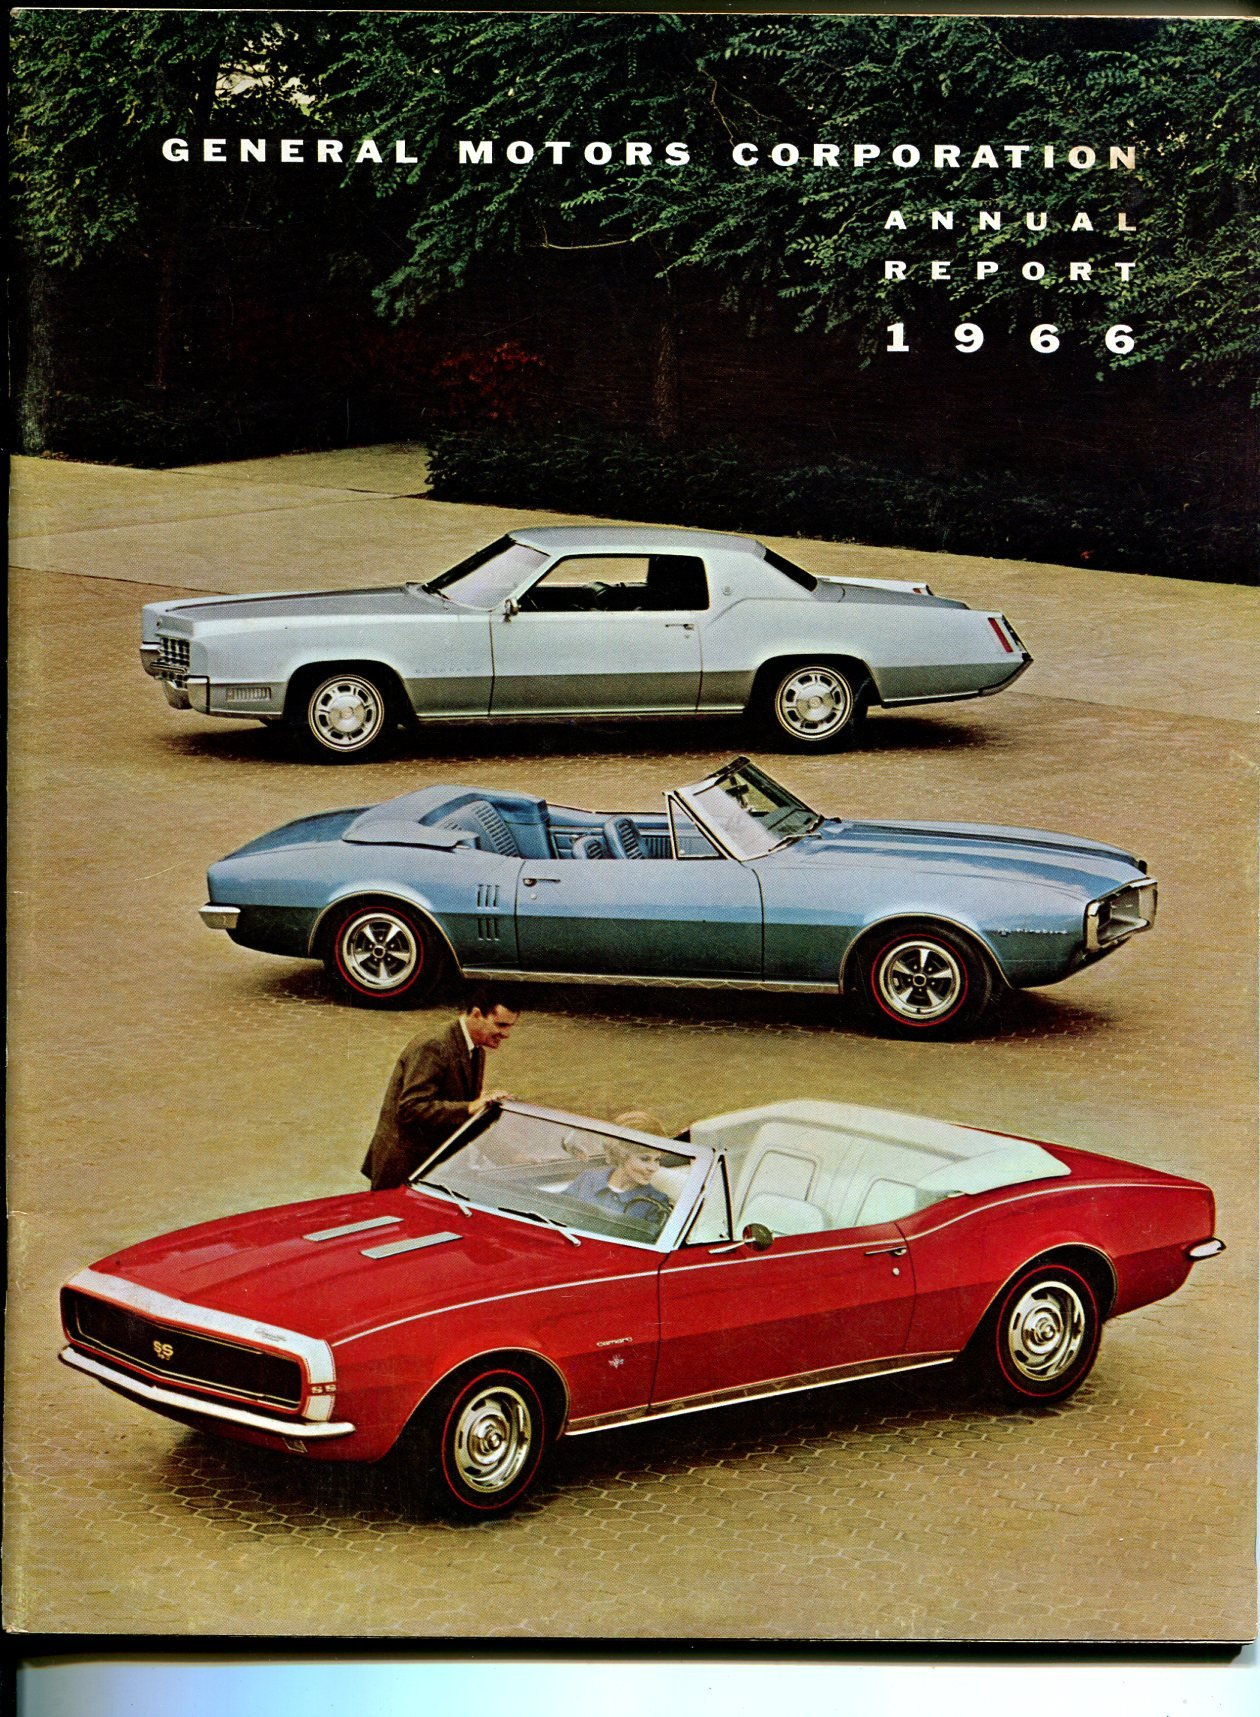 Buy General Motors Financial Now!